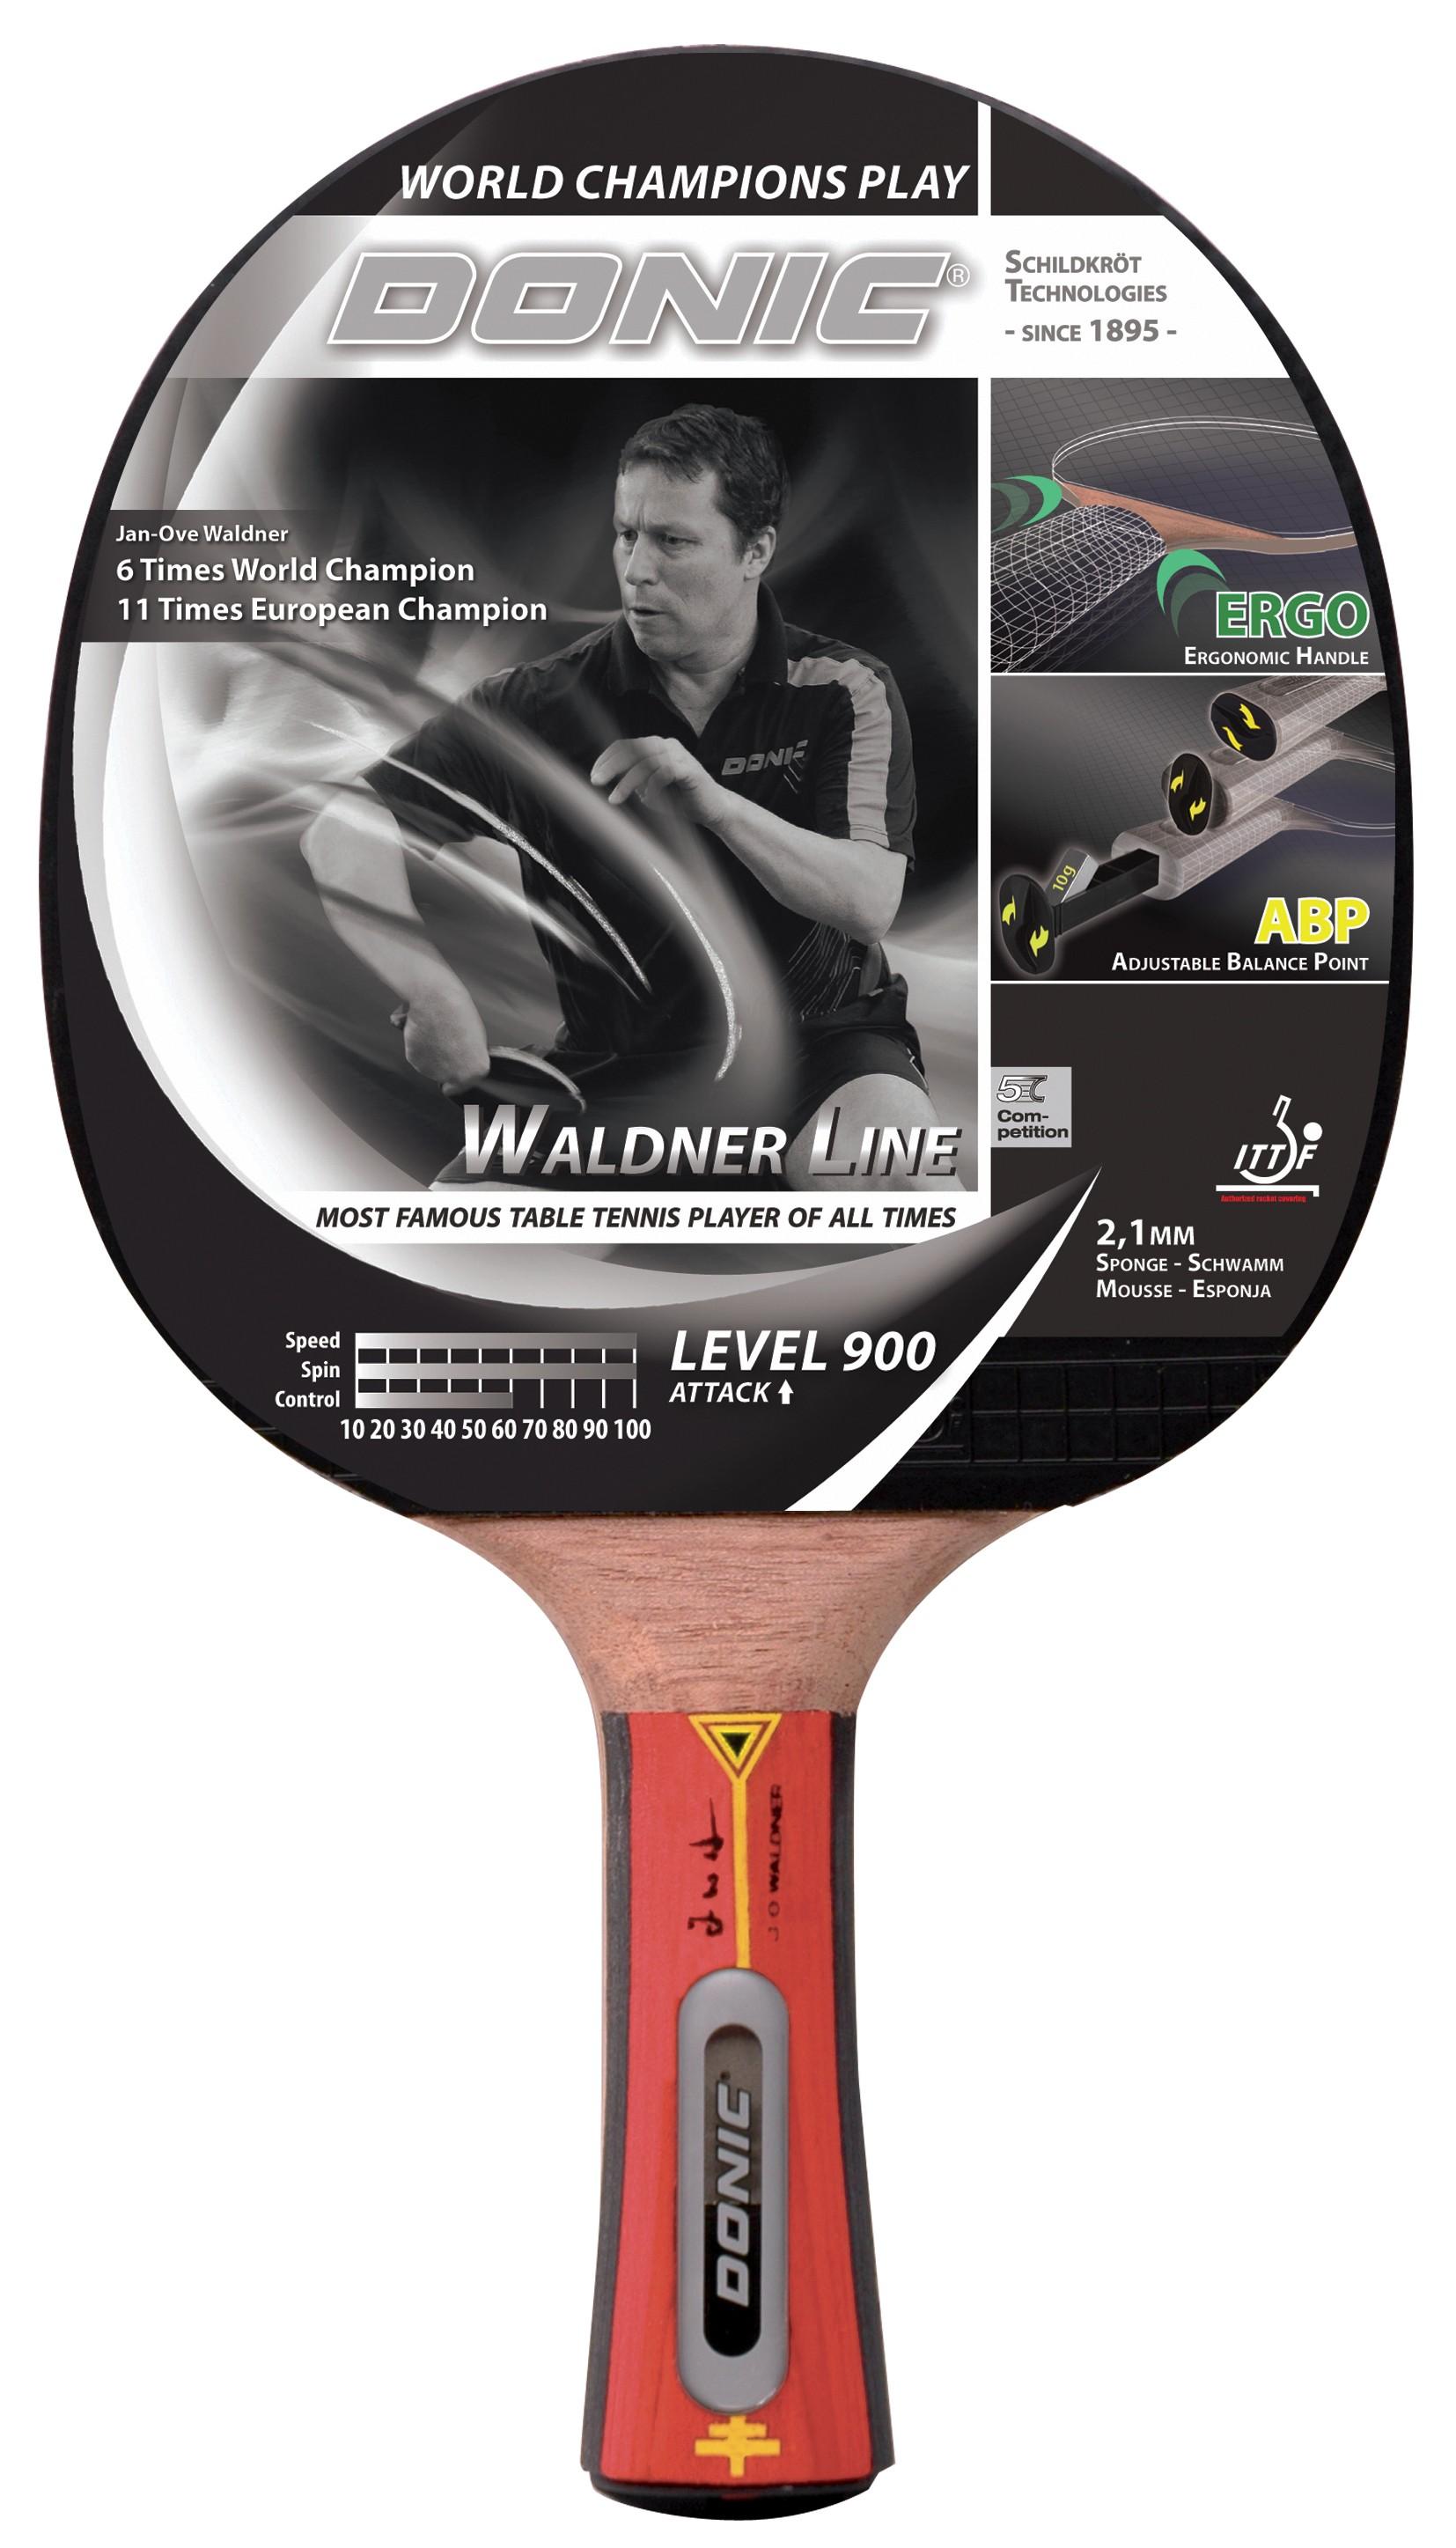 Paleta Tenis De Masa  Donic  Waldner  Line Level 900  Atac  Concav